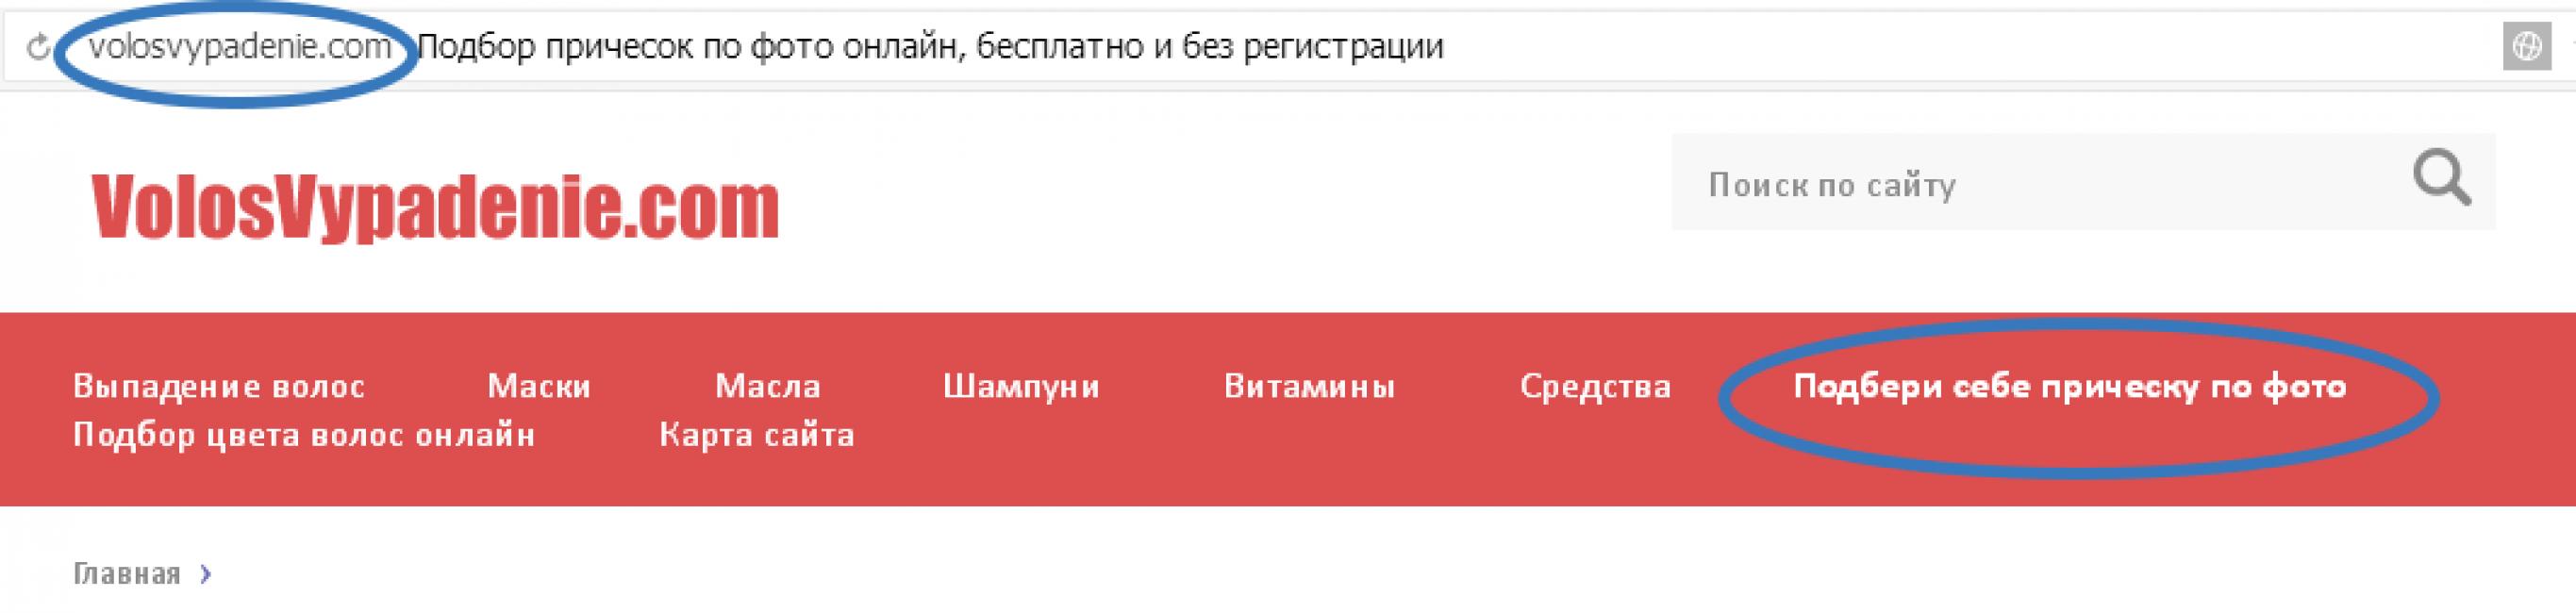 Сайт volosvypadenie.com